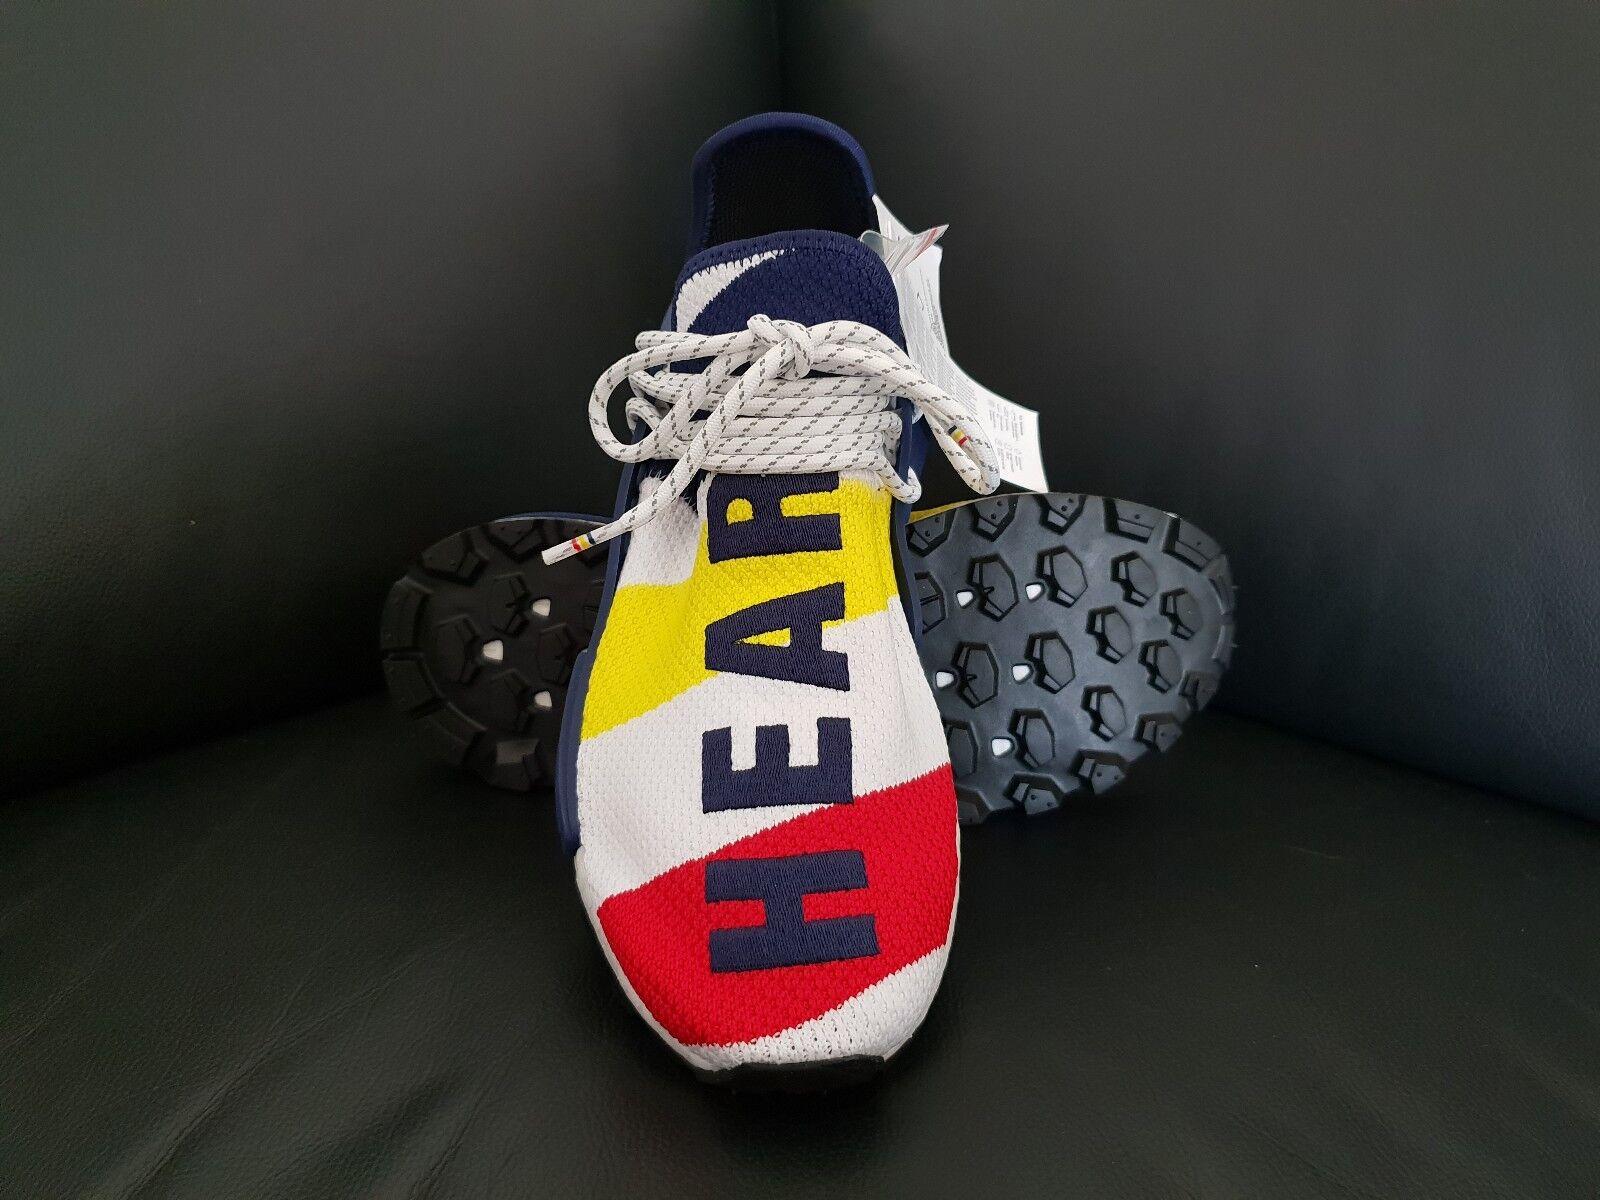 Adidas X Pharrell Williams X BBC NMD HU, Multi Coloreeee, (BB9544), 9.5 US